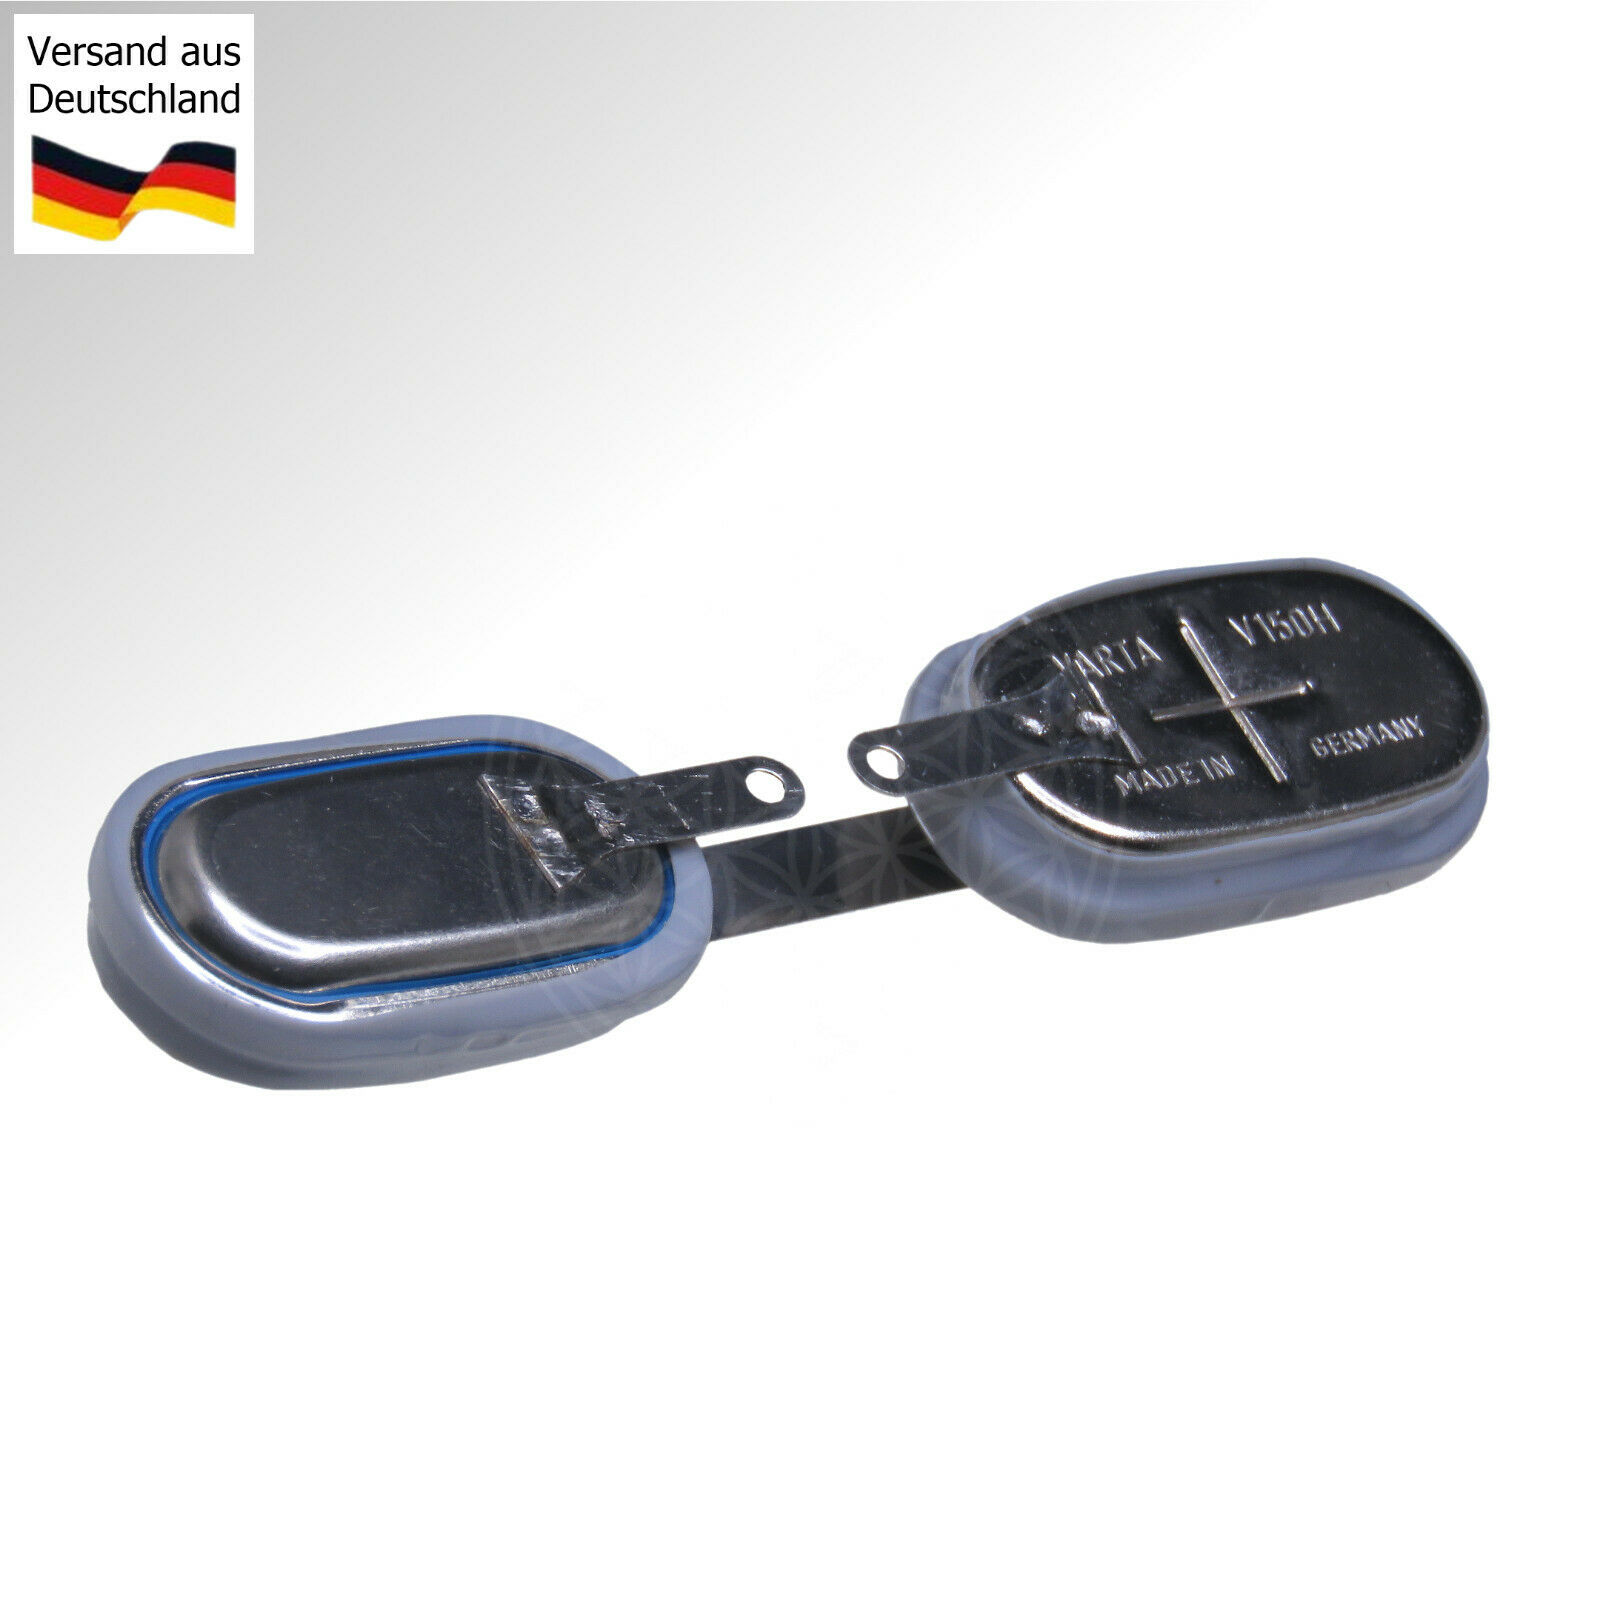 Faller 163205 2 Lenkschleifer für Sonderfahrzeuge H0 Car System Neu